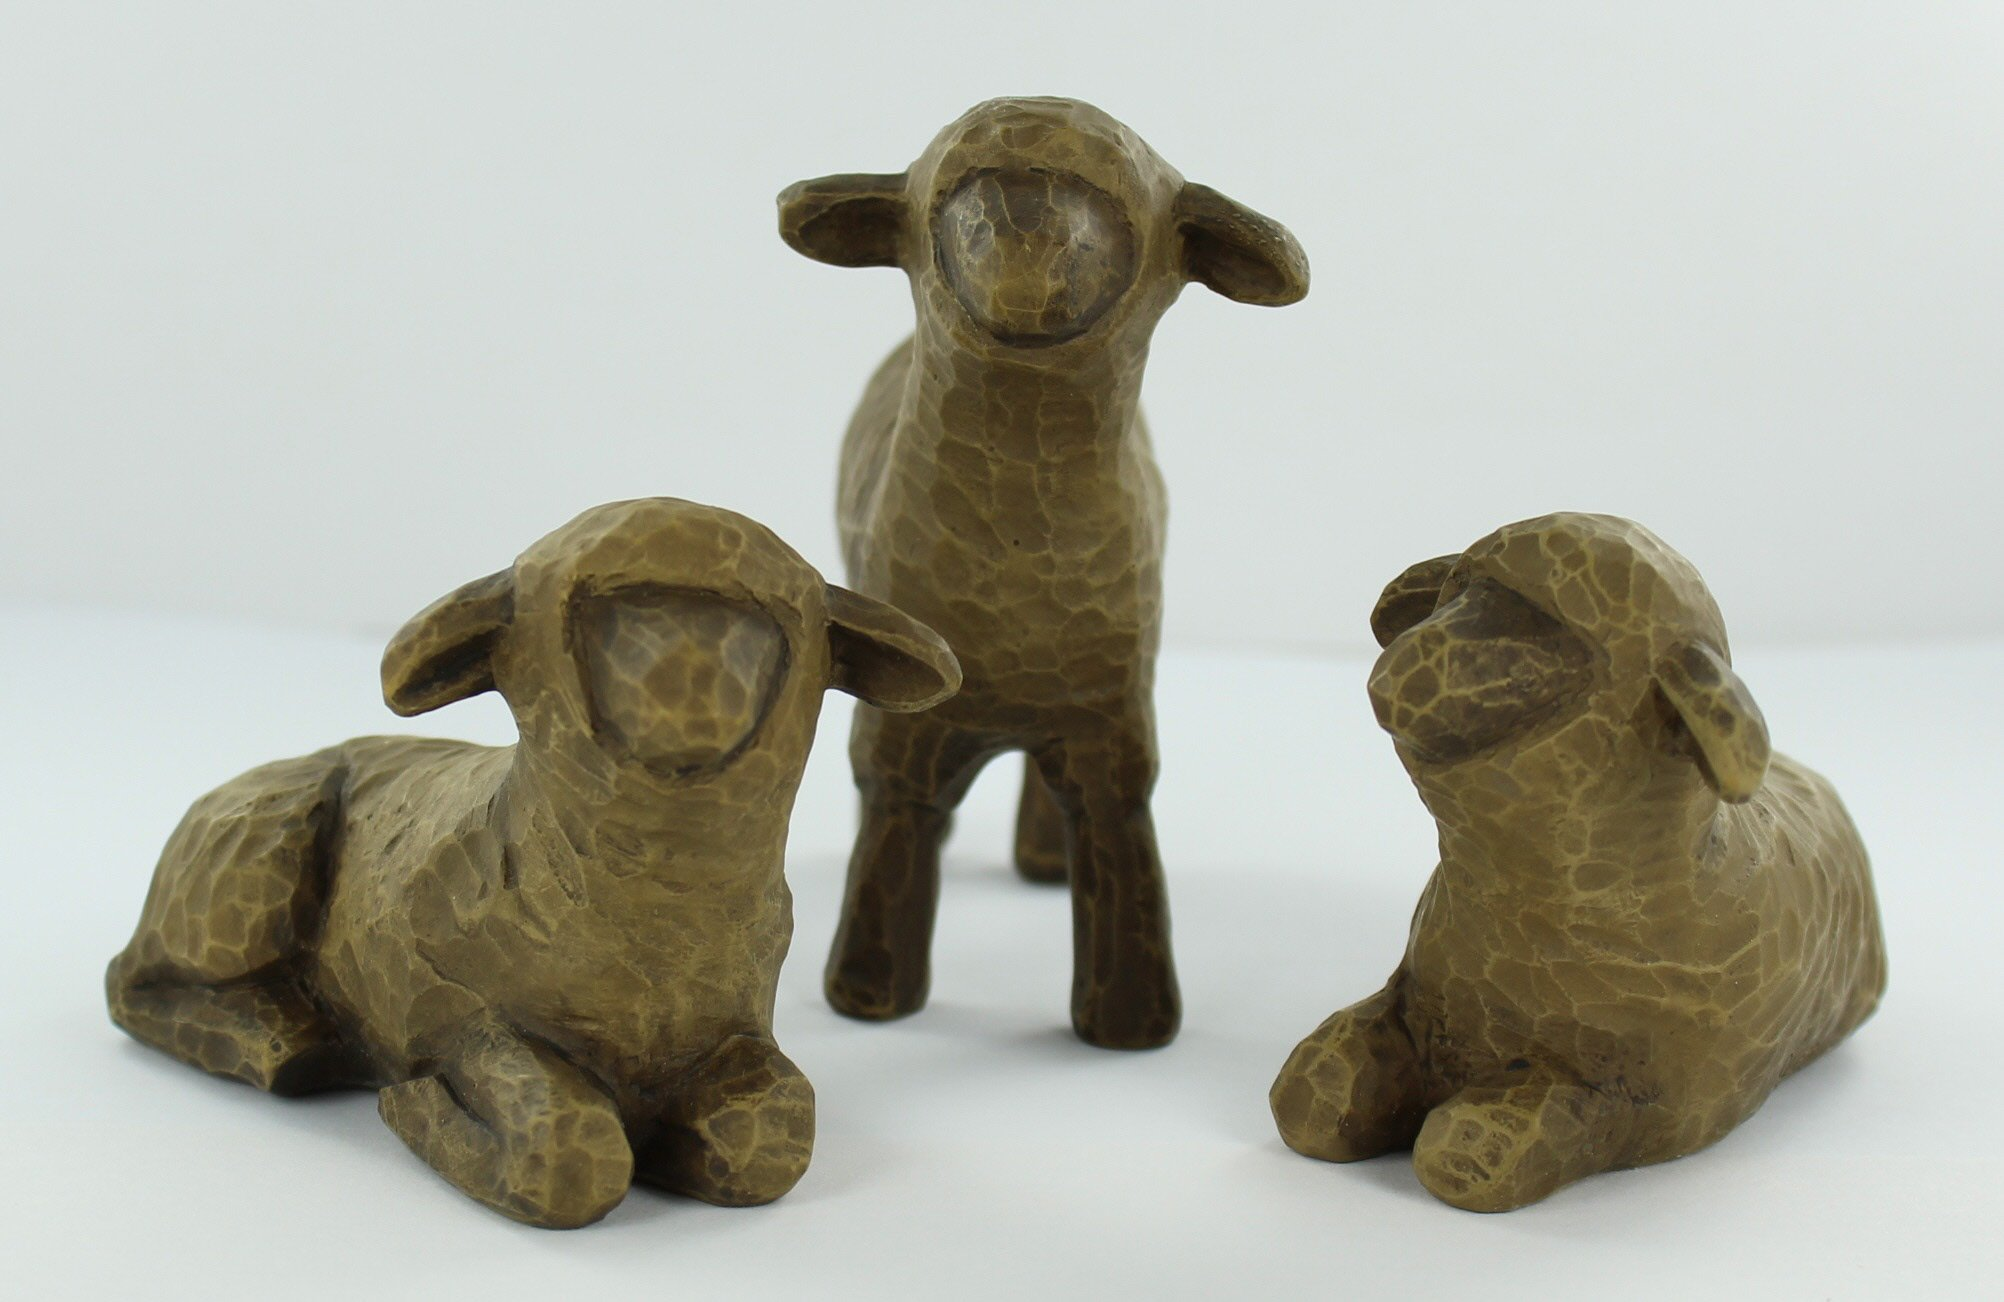 Three Black Sheep Willow Tree Nativity Figurines